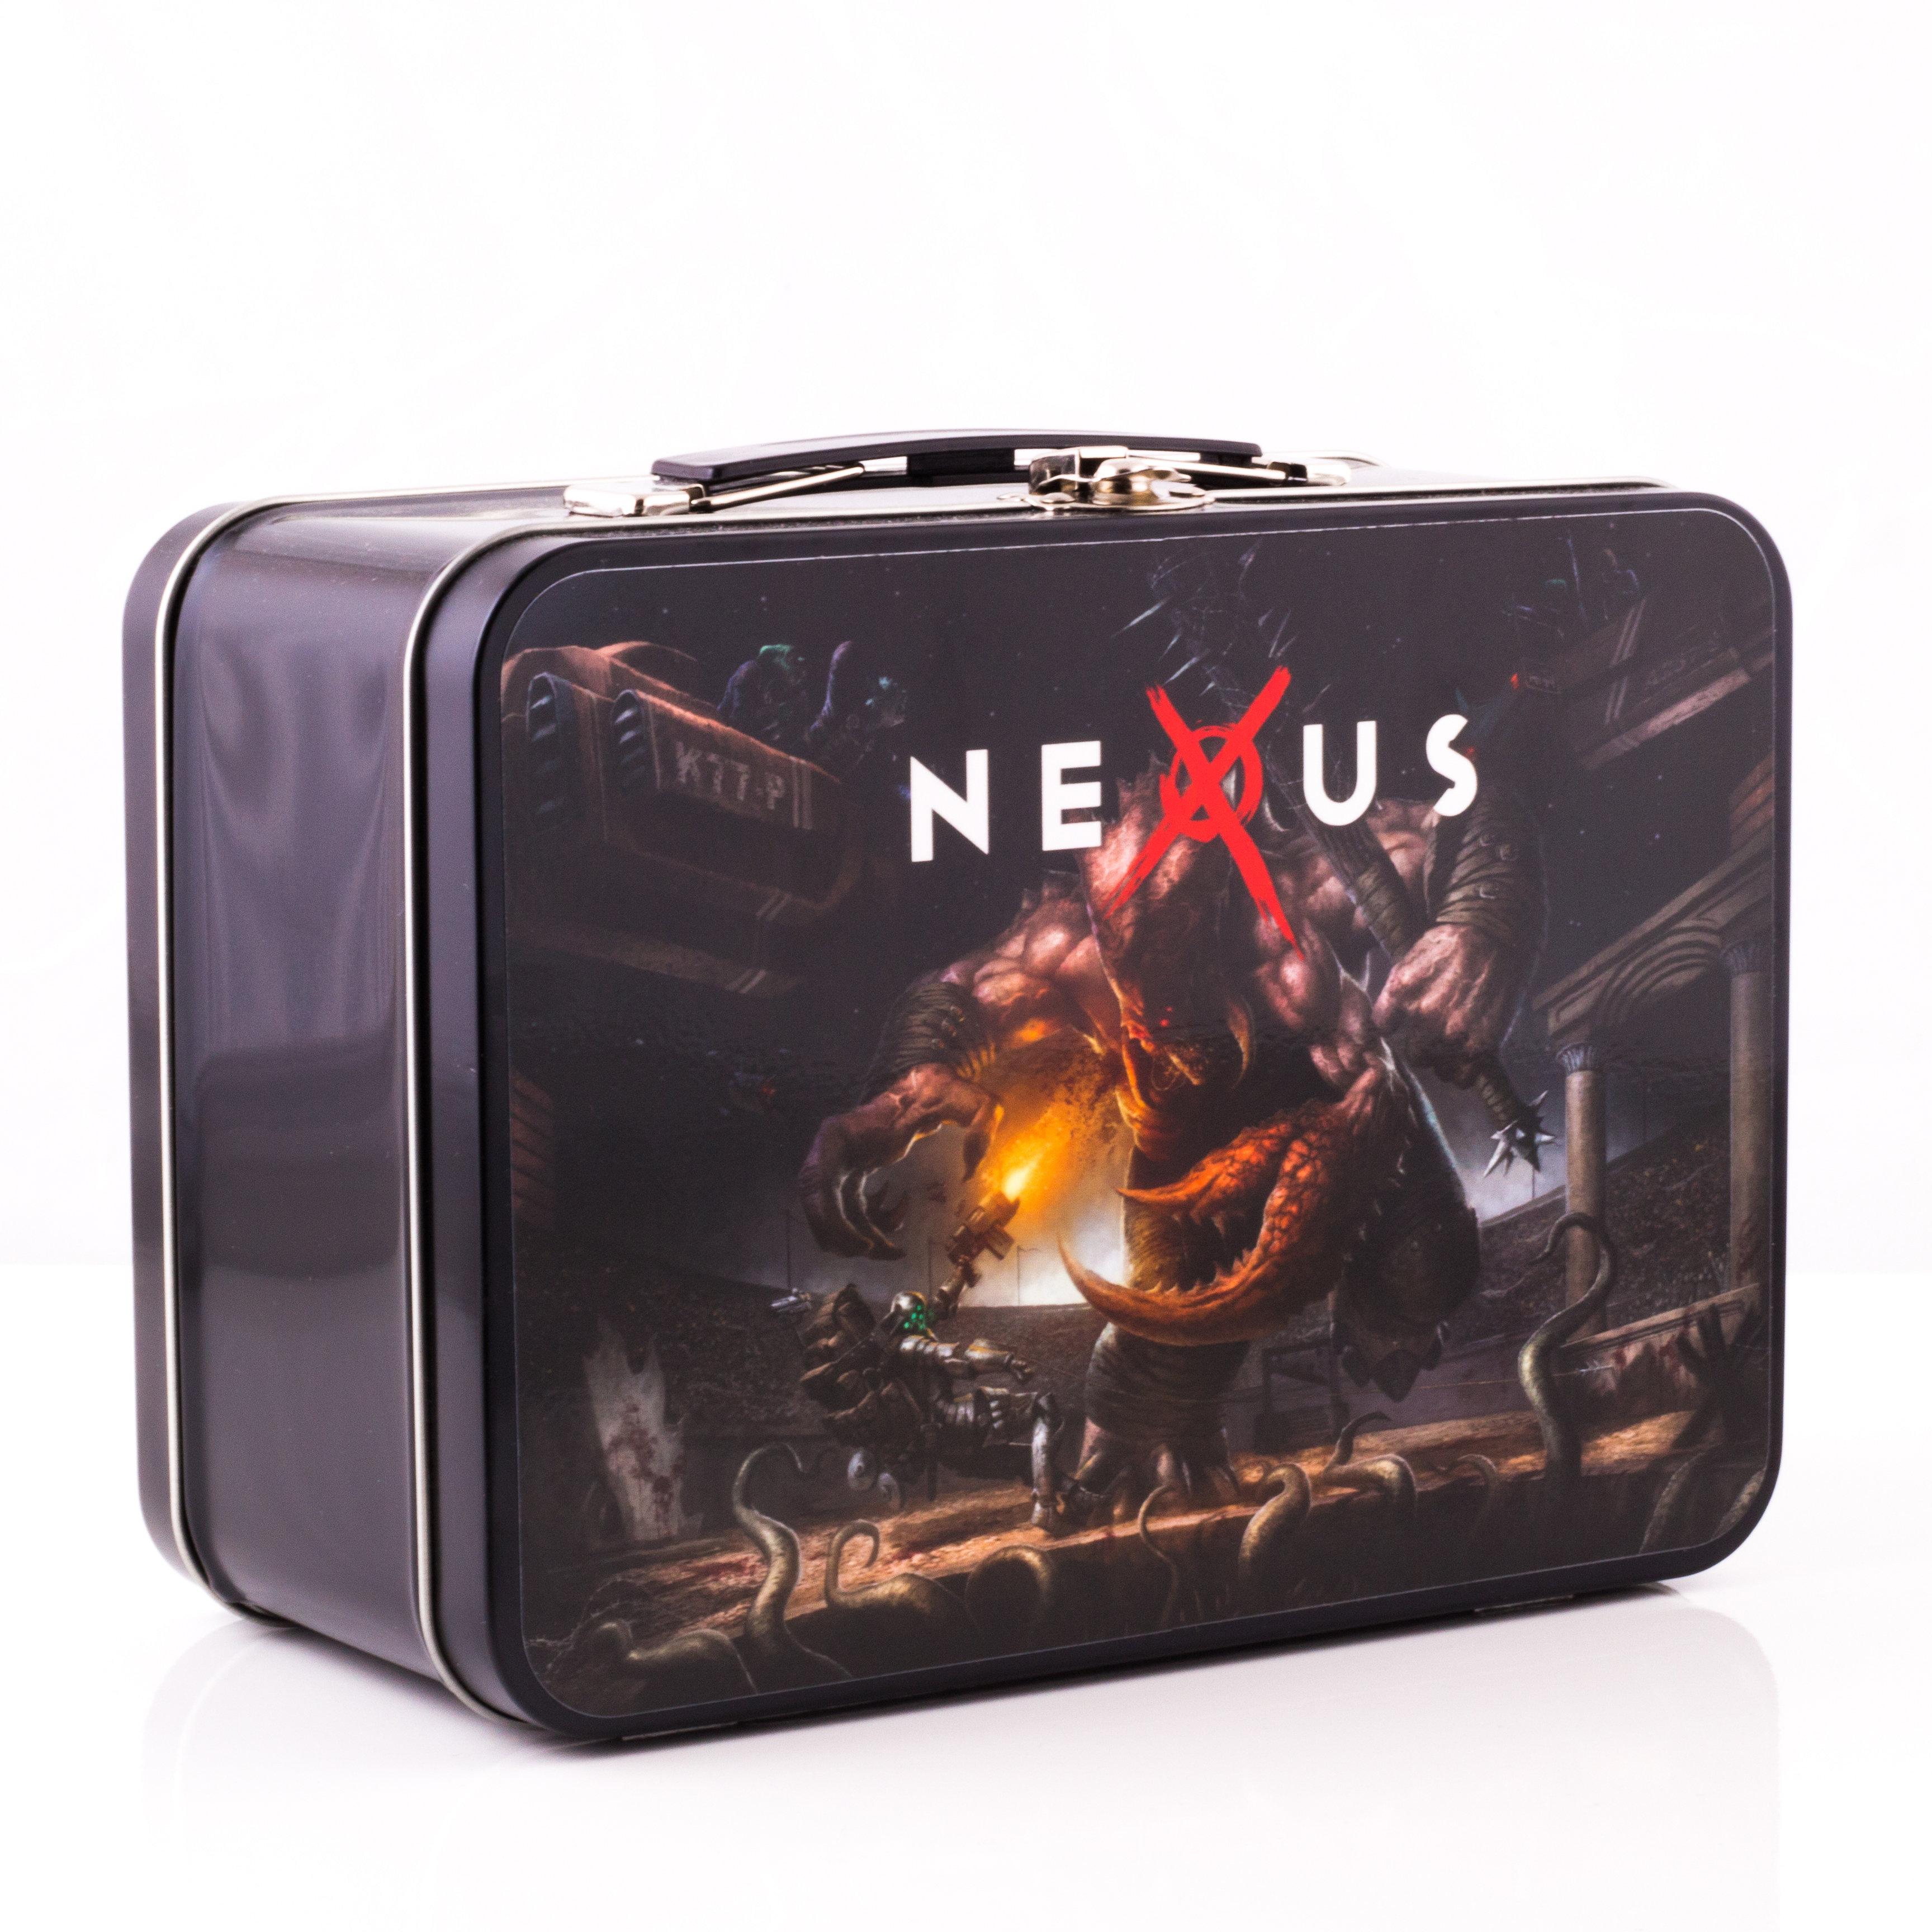 Nexus Lunch Box NXLB01